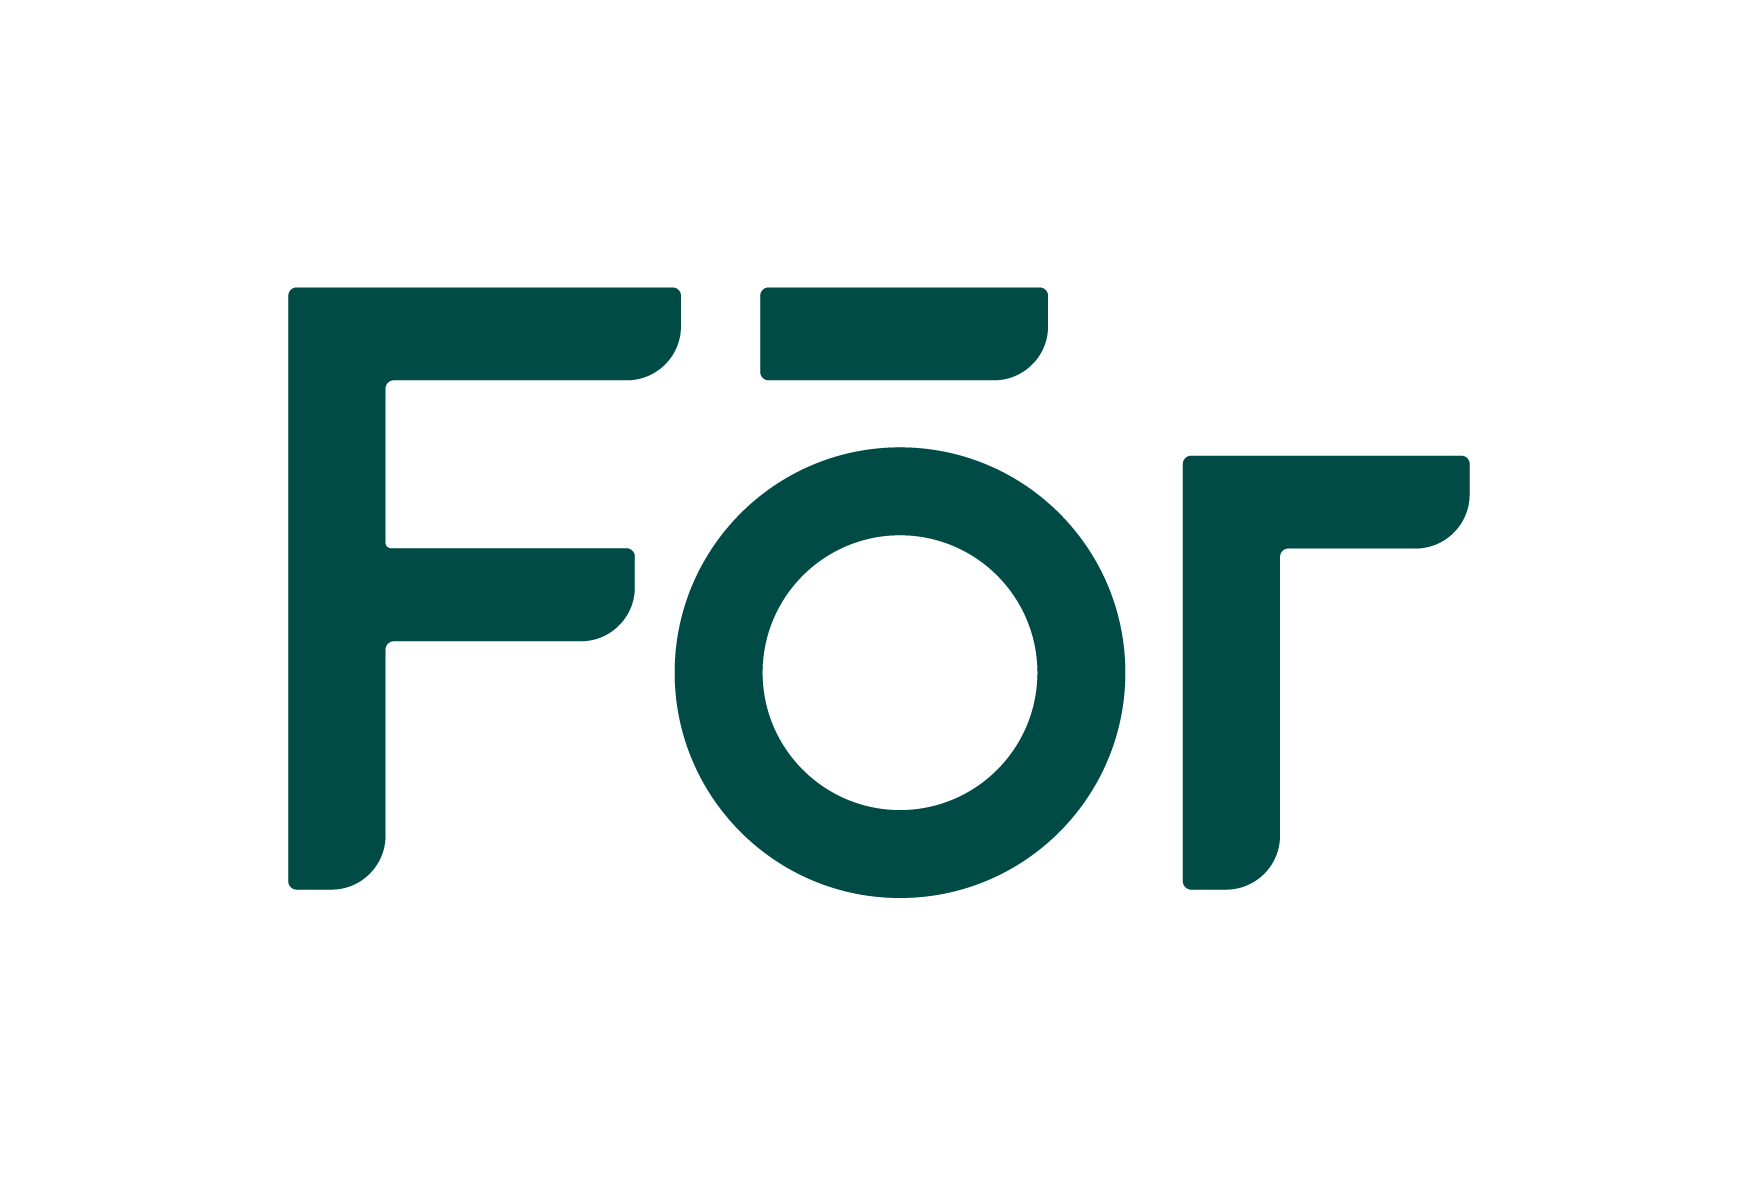 FOZ_WORDMARK_POS_RGB.png